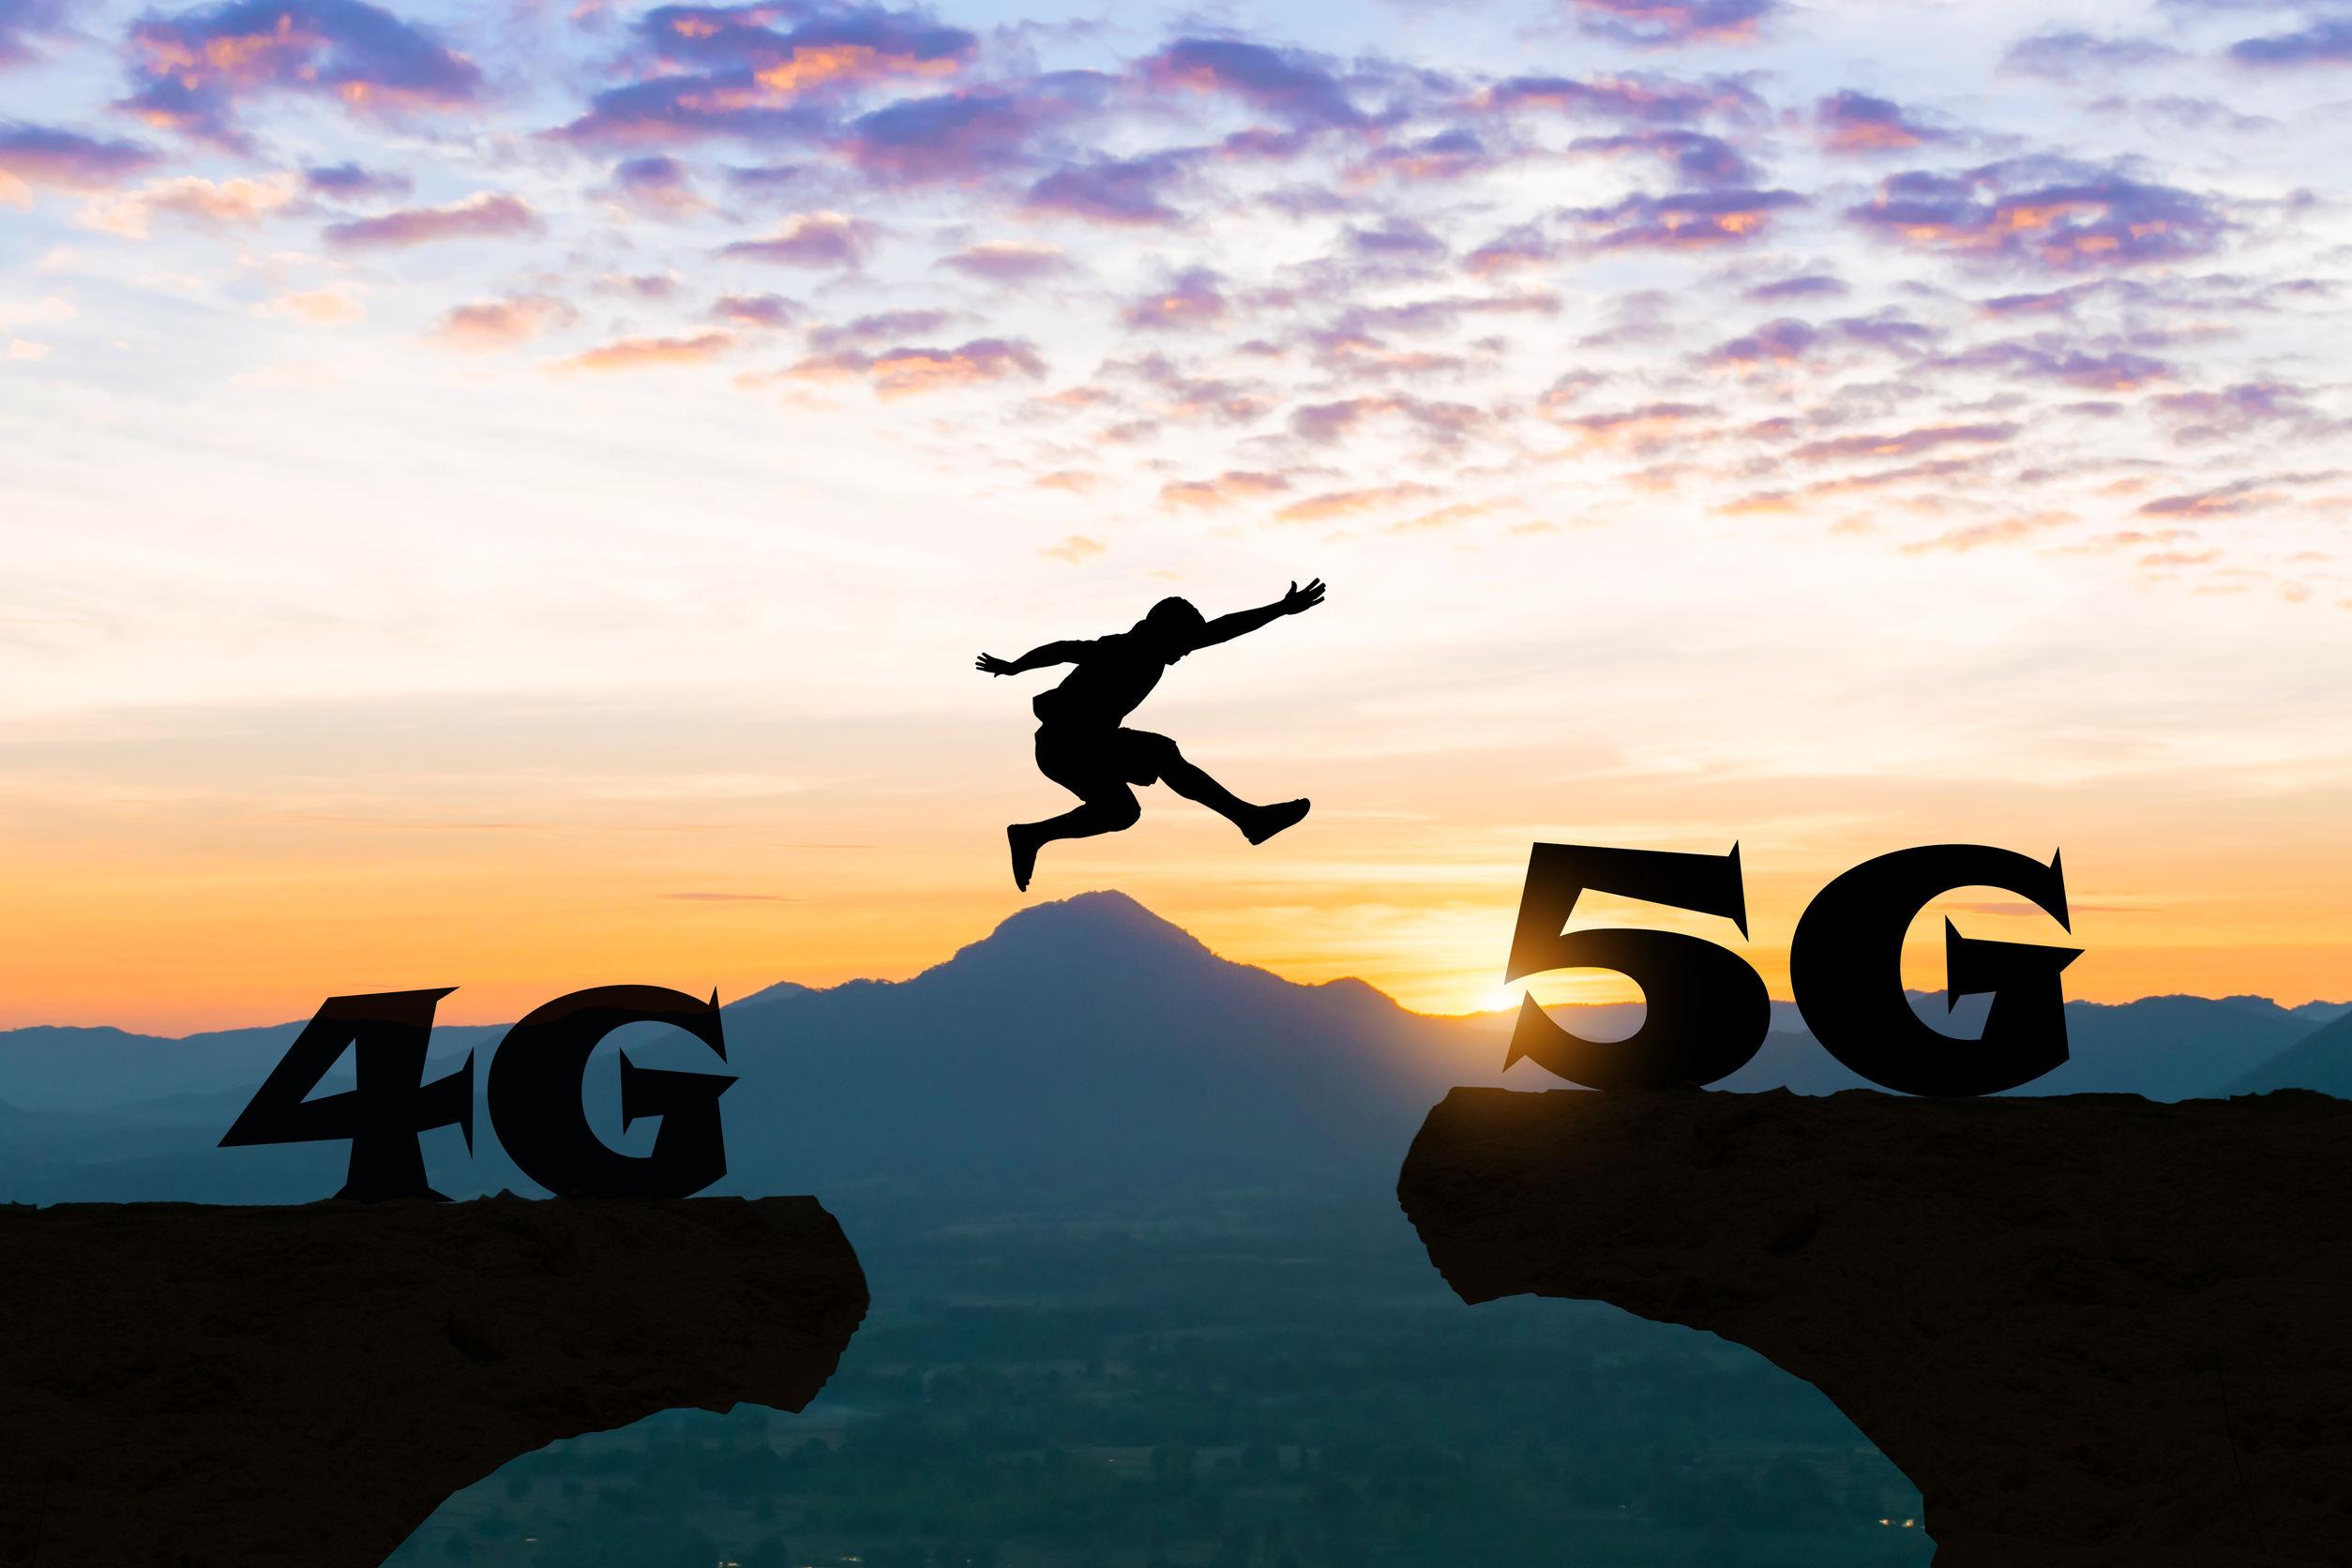 5G時代大未來顛覆舊習 智慧浪潮下的腦力戰爭-5G大時代